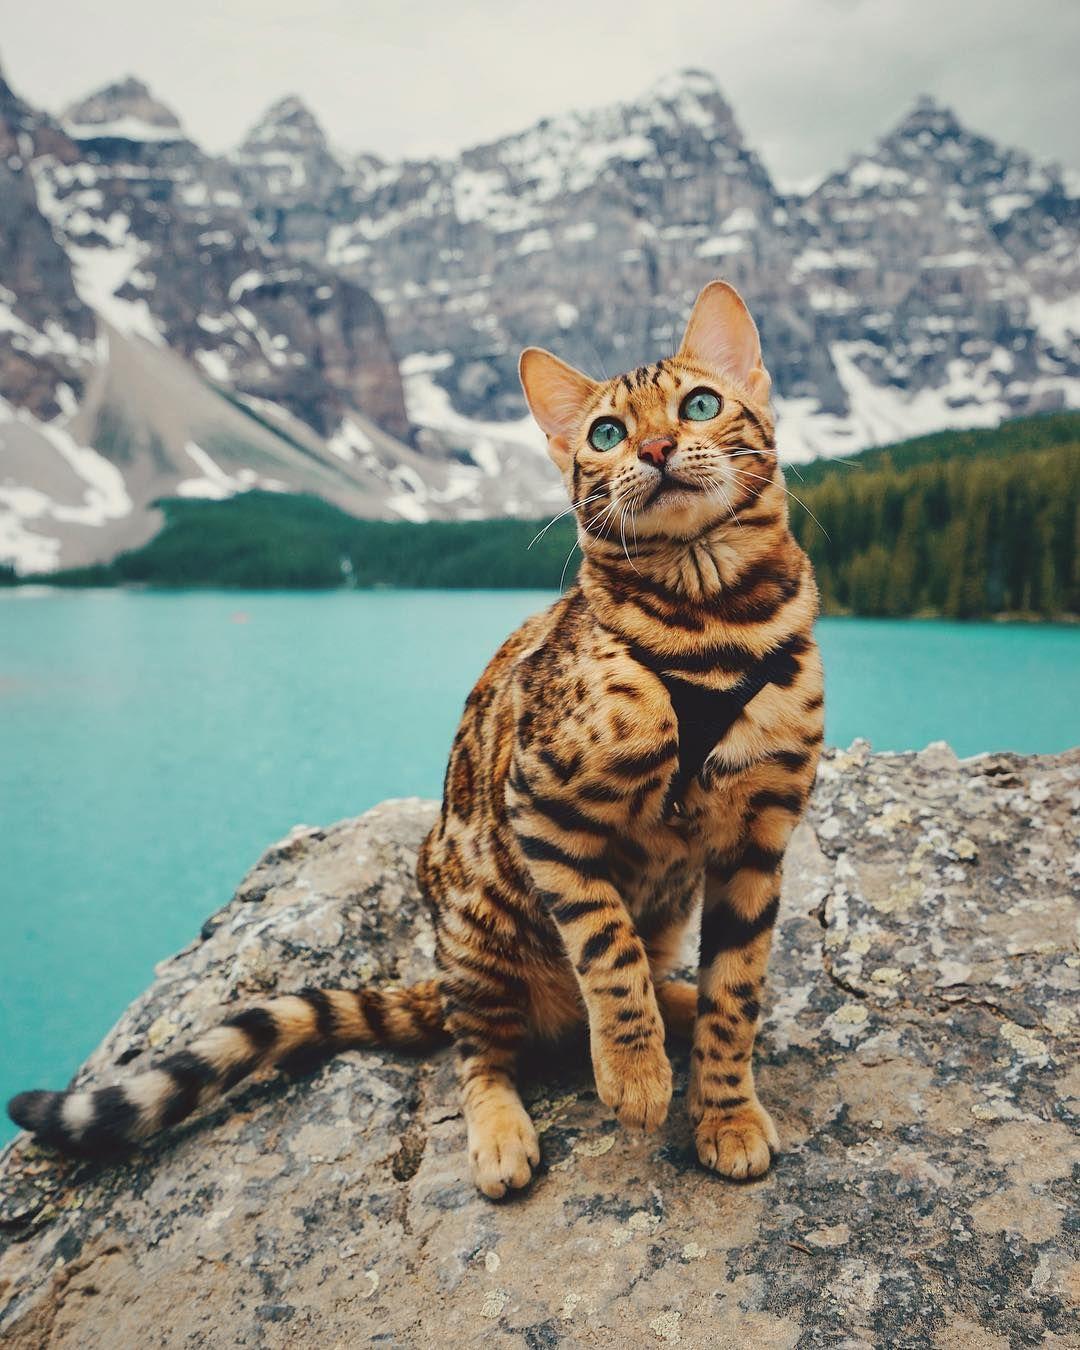 This Adventurous Cat Is The Instagram Model We Need Right Now Cats Bengal Cat Adventure Cat